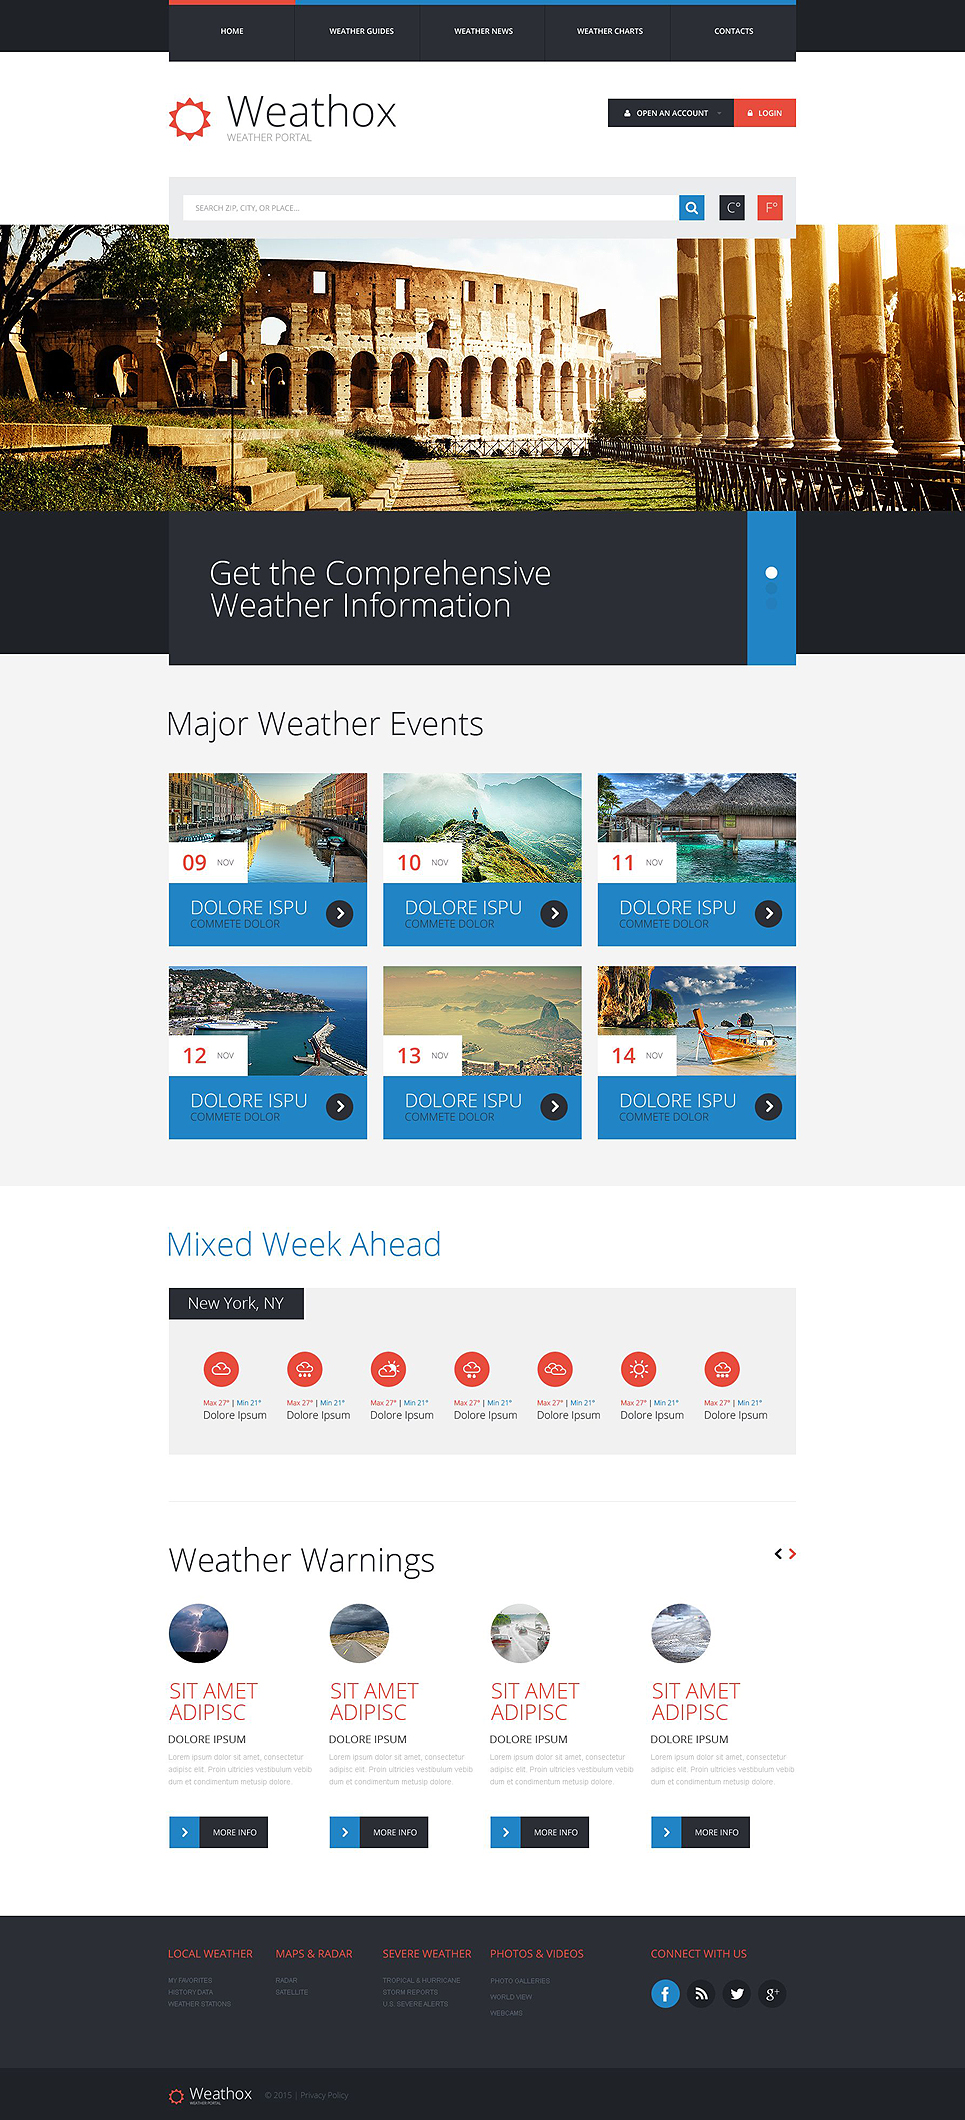 weather forecast web template. Black Bedroom Furniture Sets. Home Design Ideas